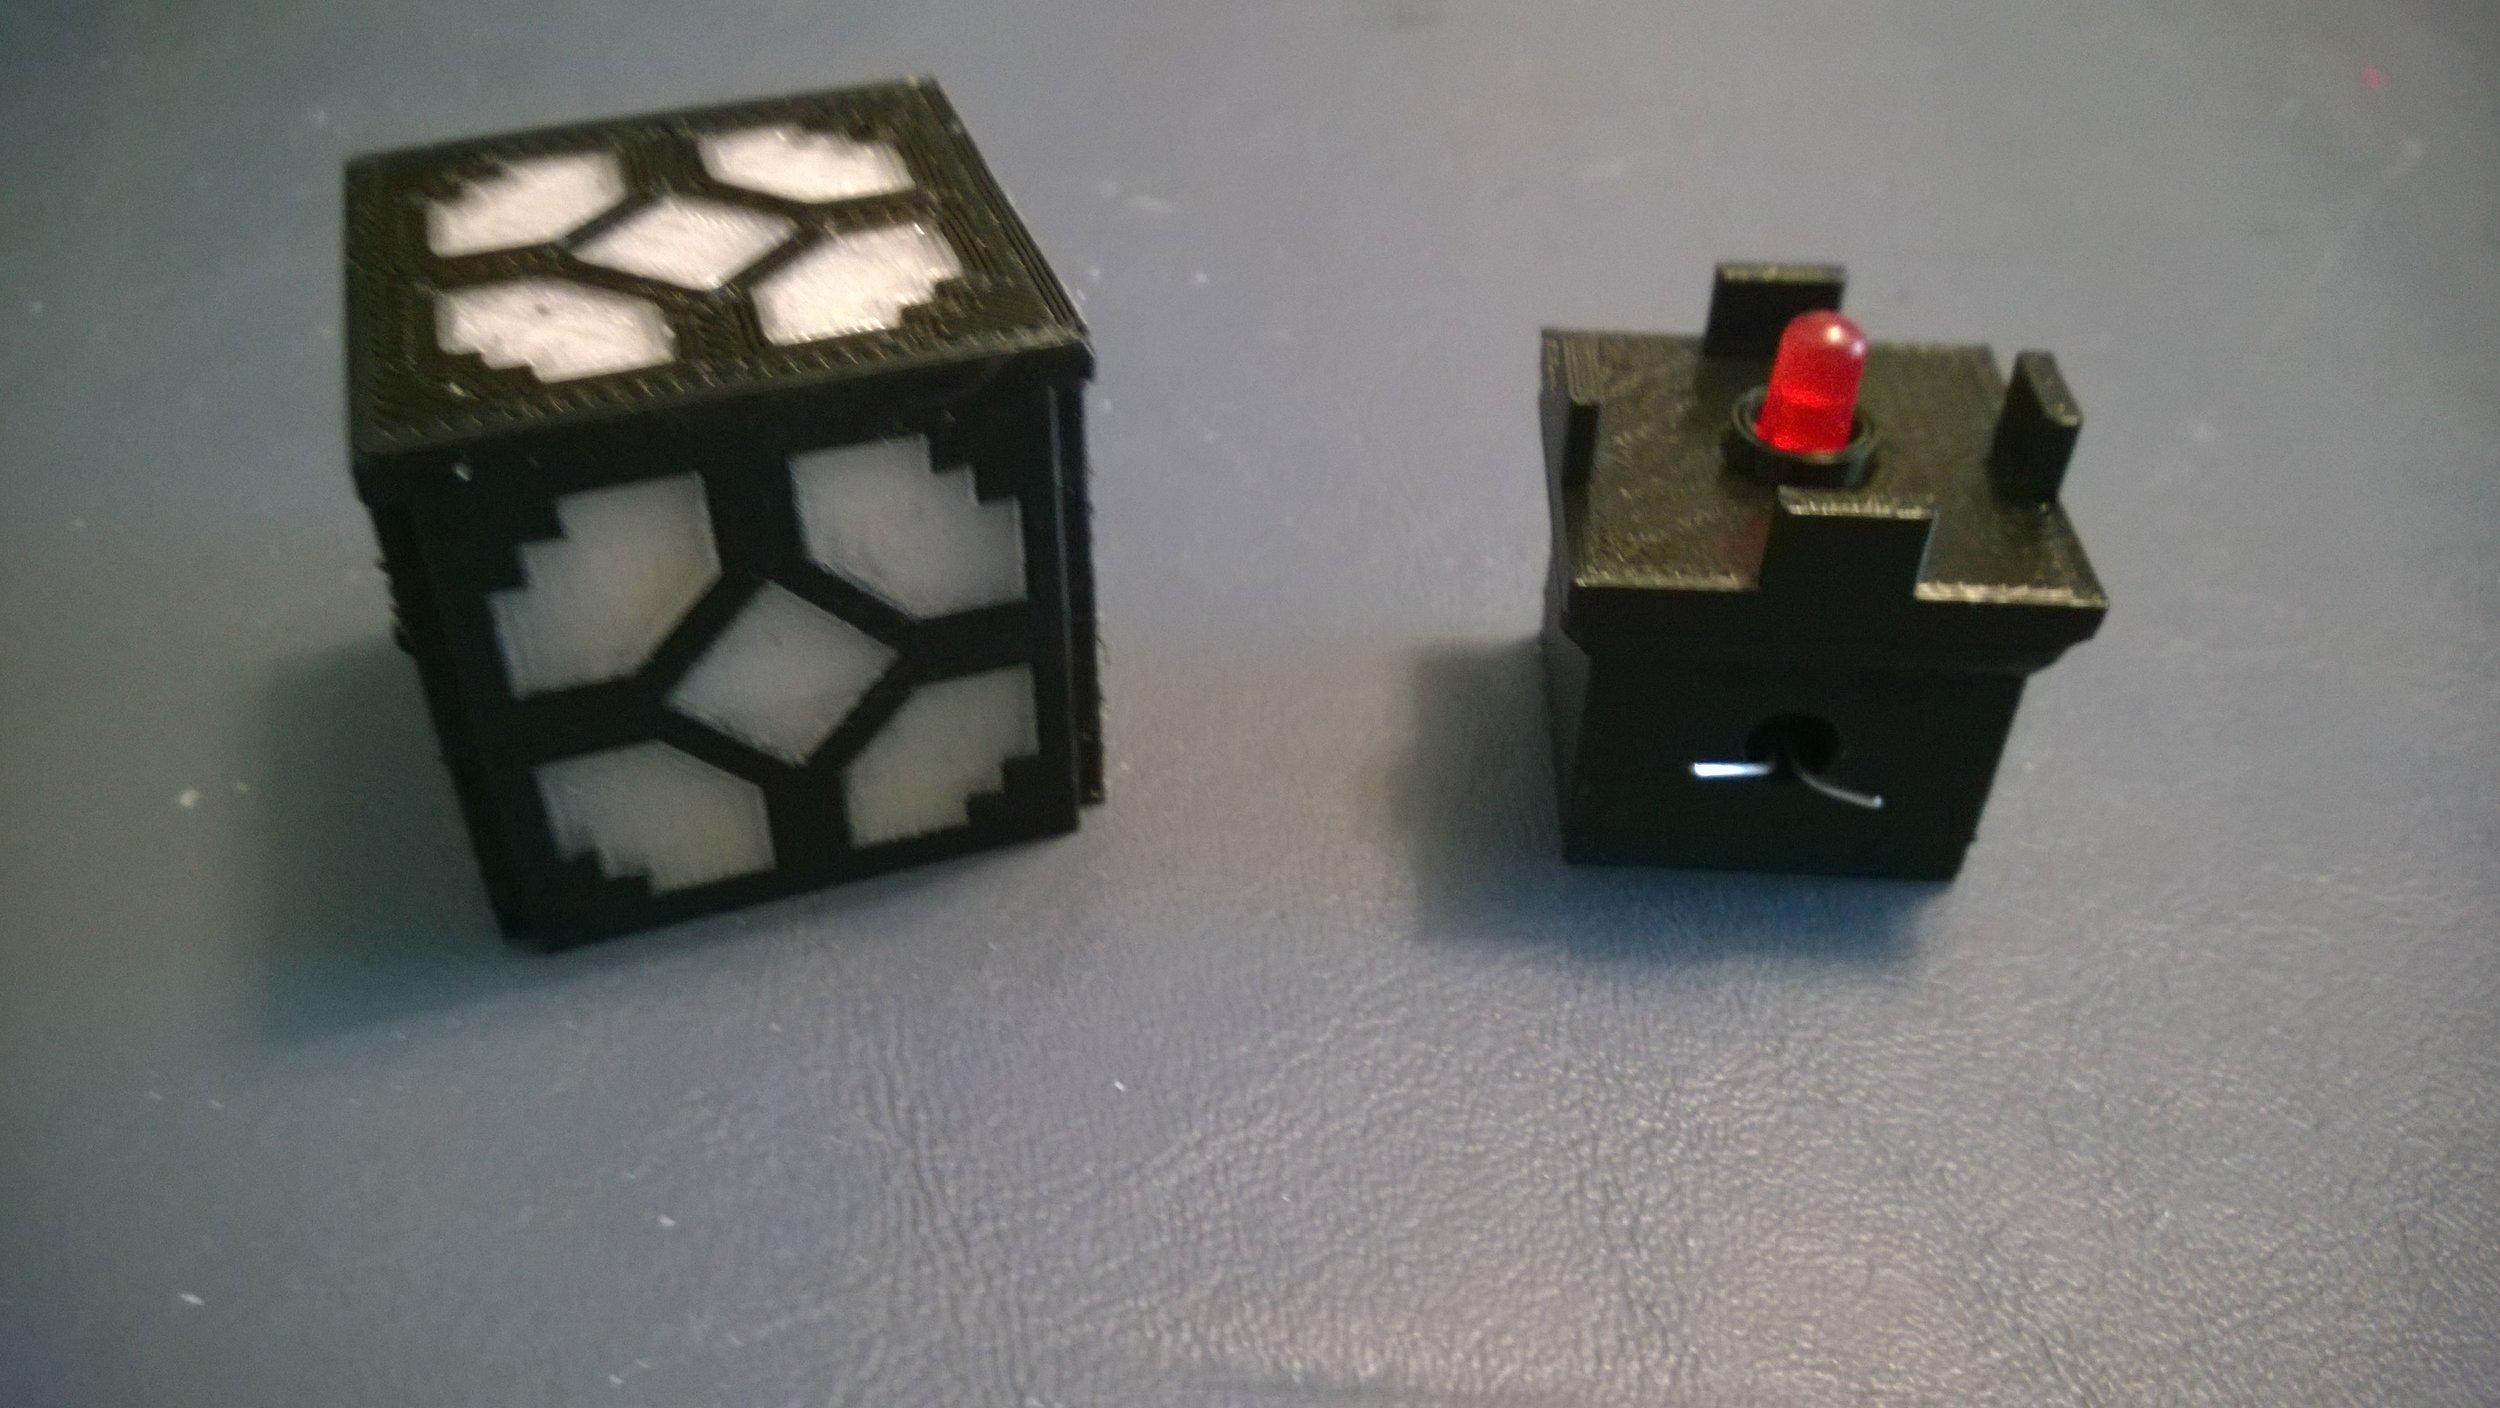 Lego Minecraft Redstone Lantern